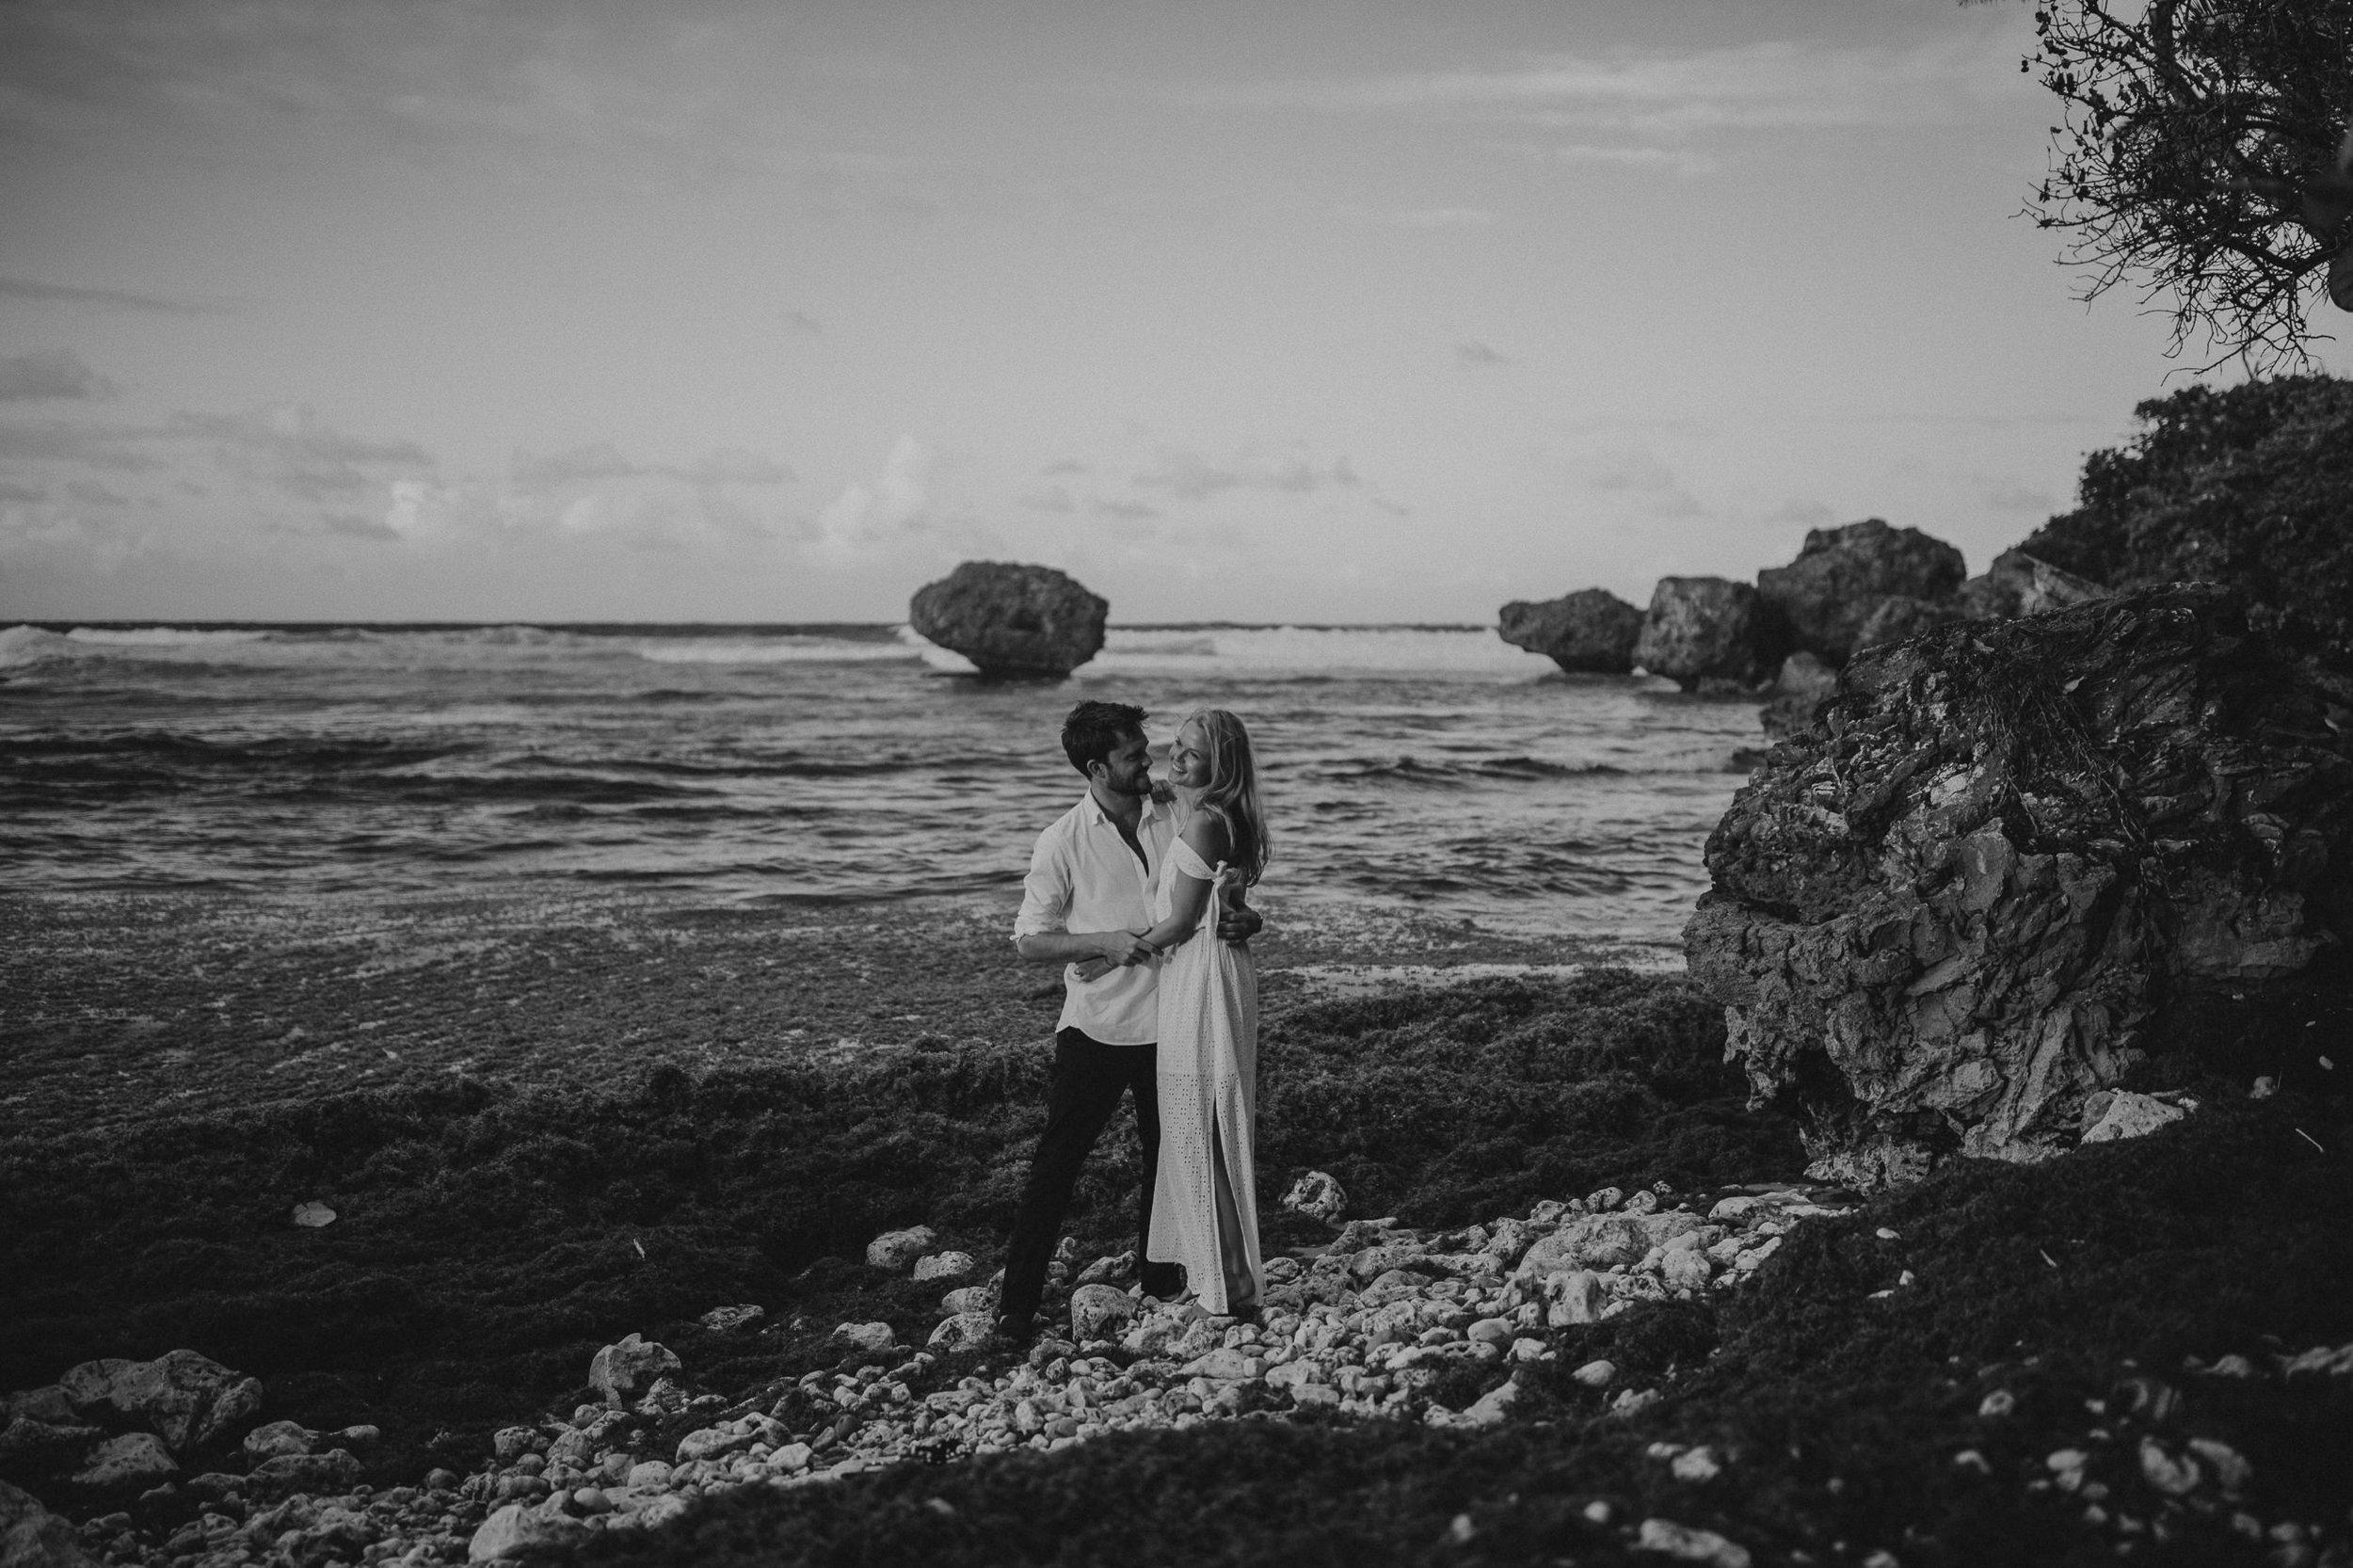 barbados_wedding_portrait_photographer_56.jpg